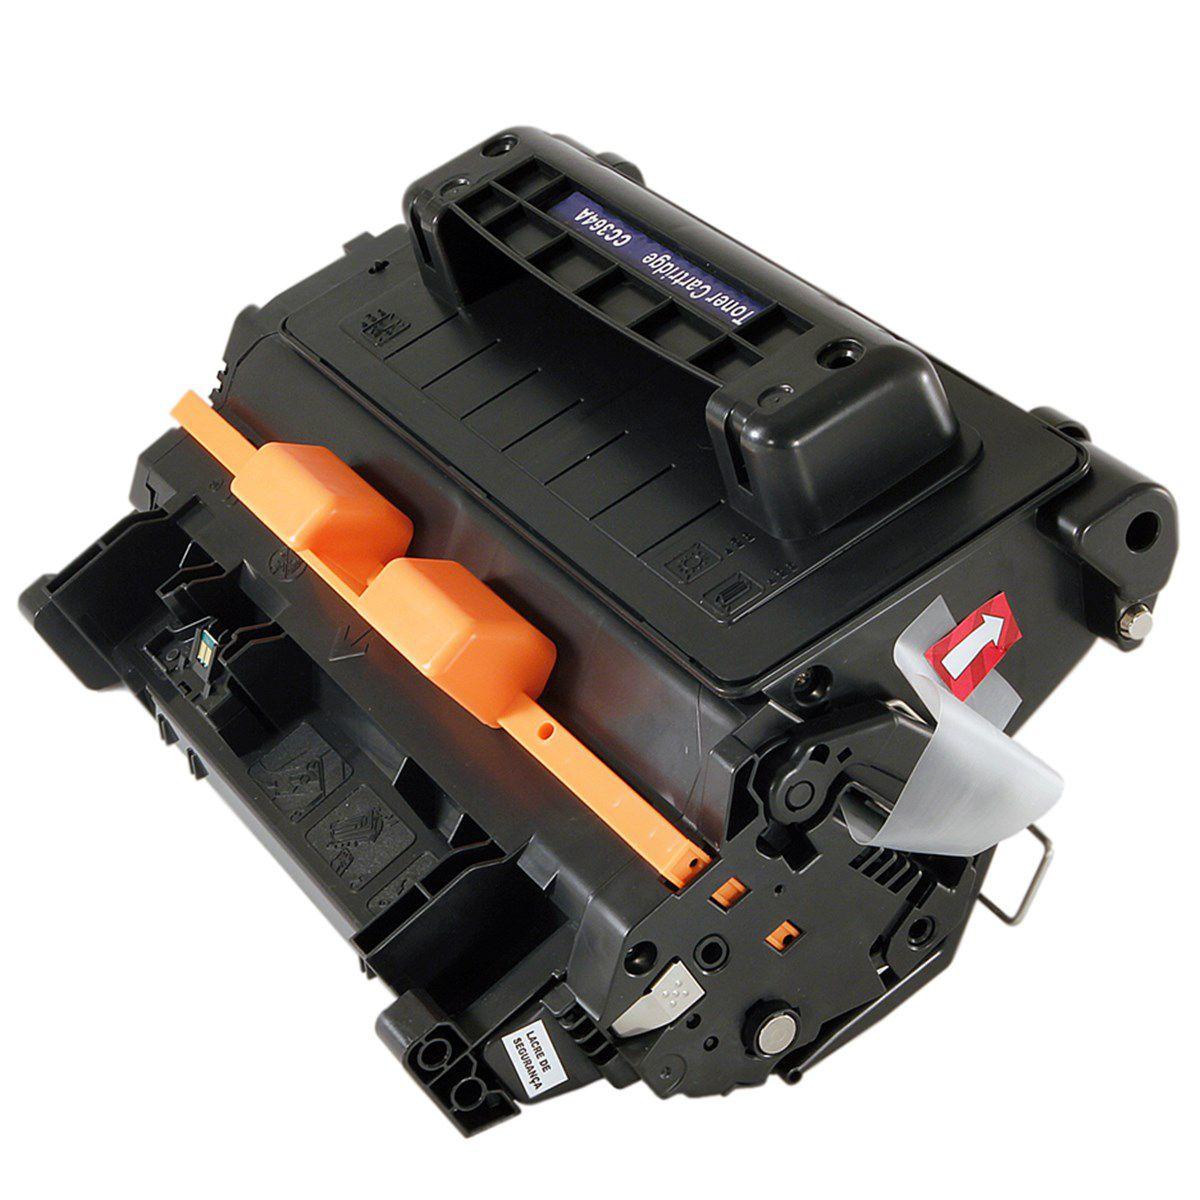 Toner Compativel com HP CC364A 364A - P4014 P4014N P4015 P4015N P4515 P4515N